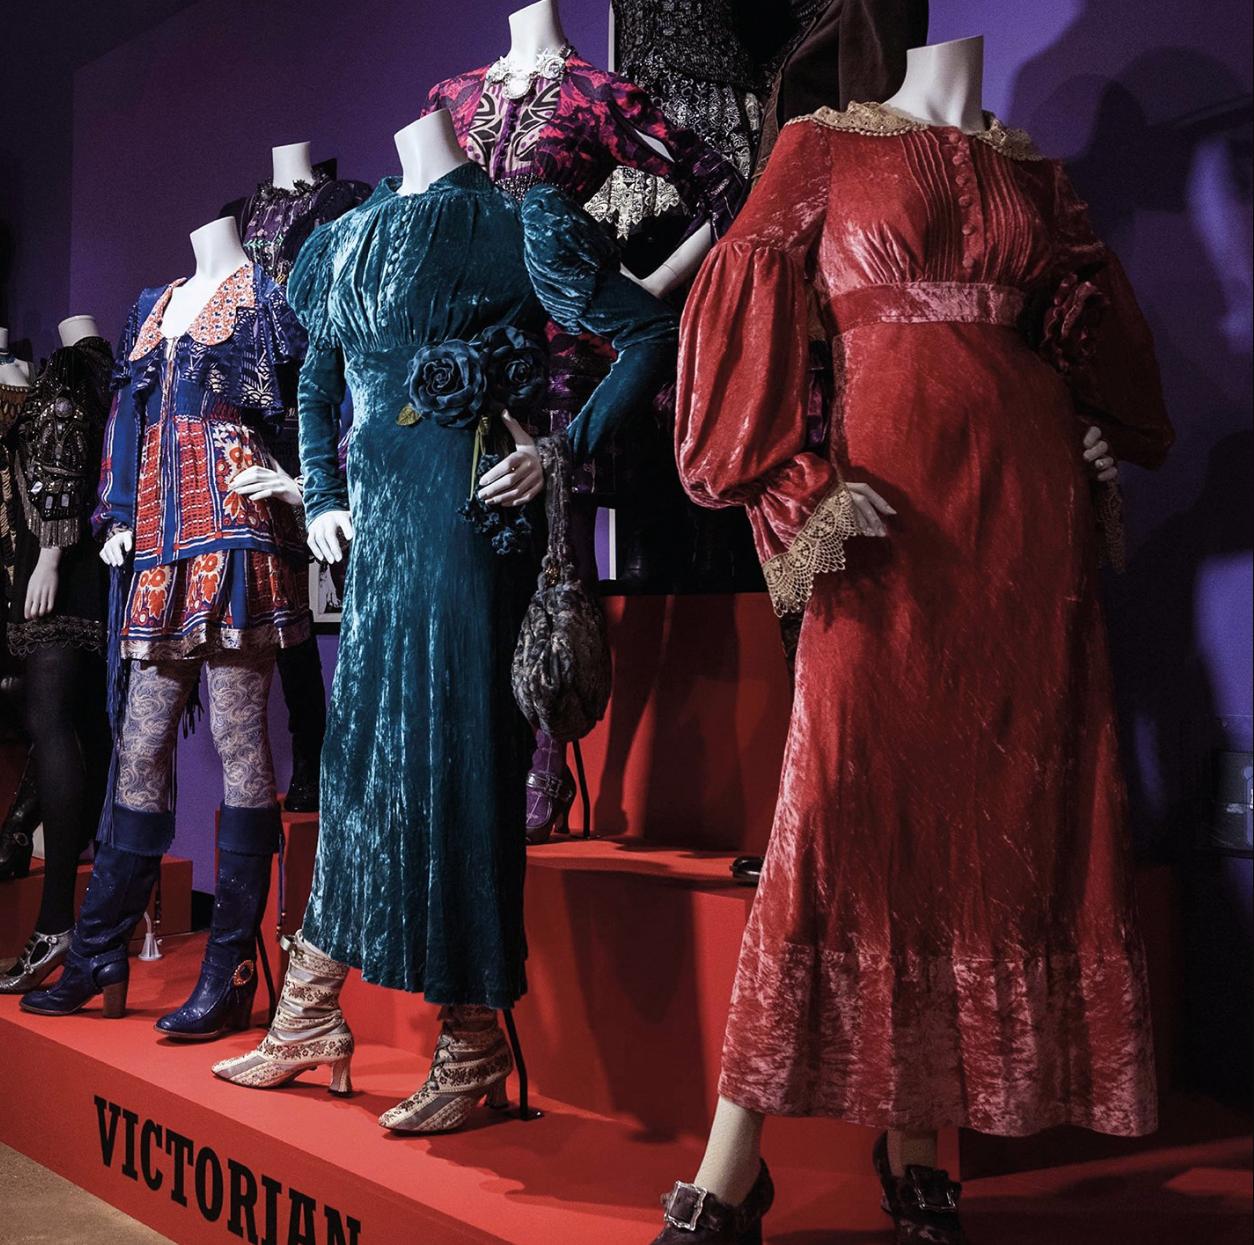 Fashion Textile Museum on demand events